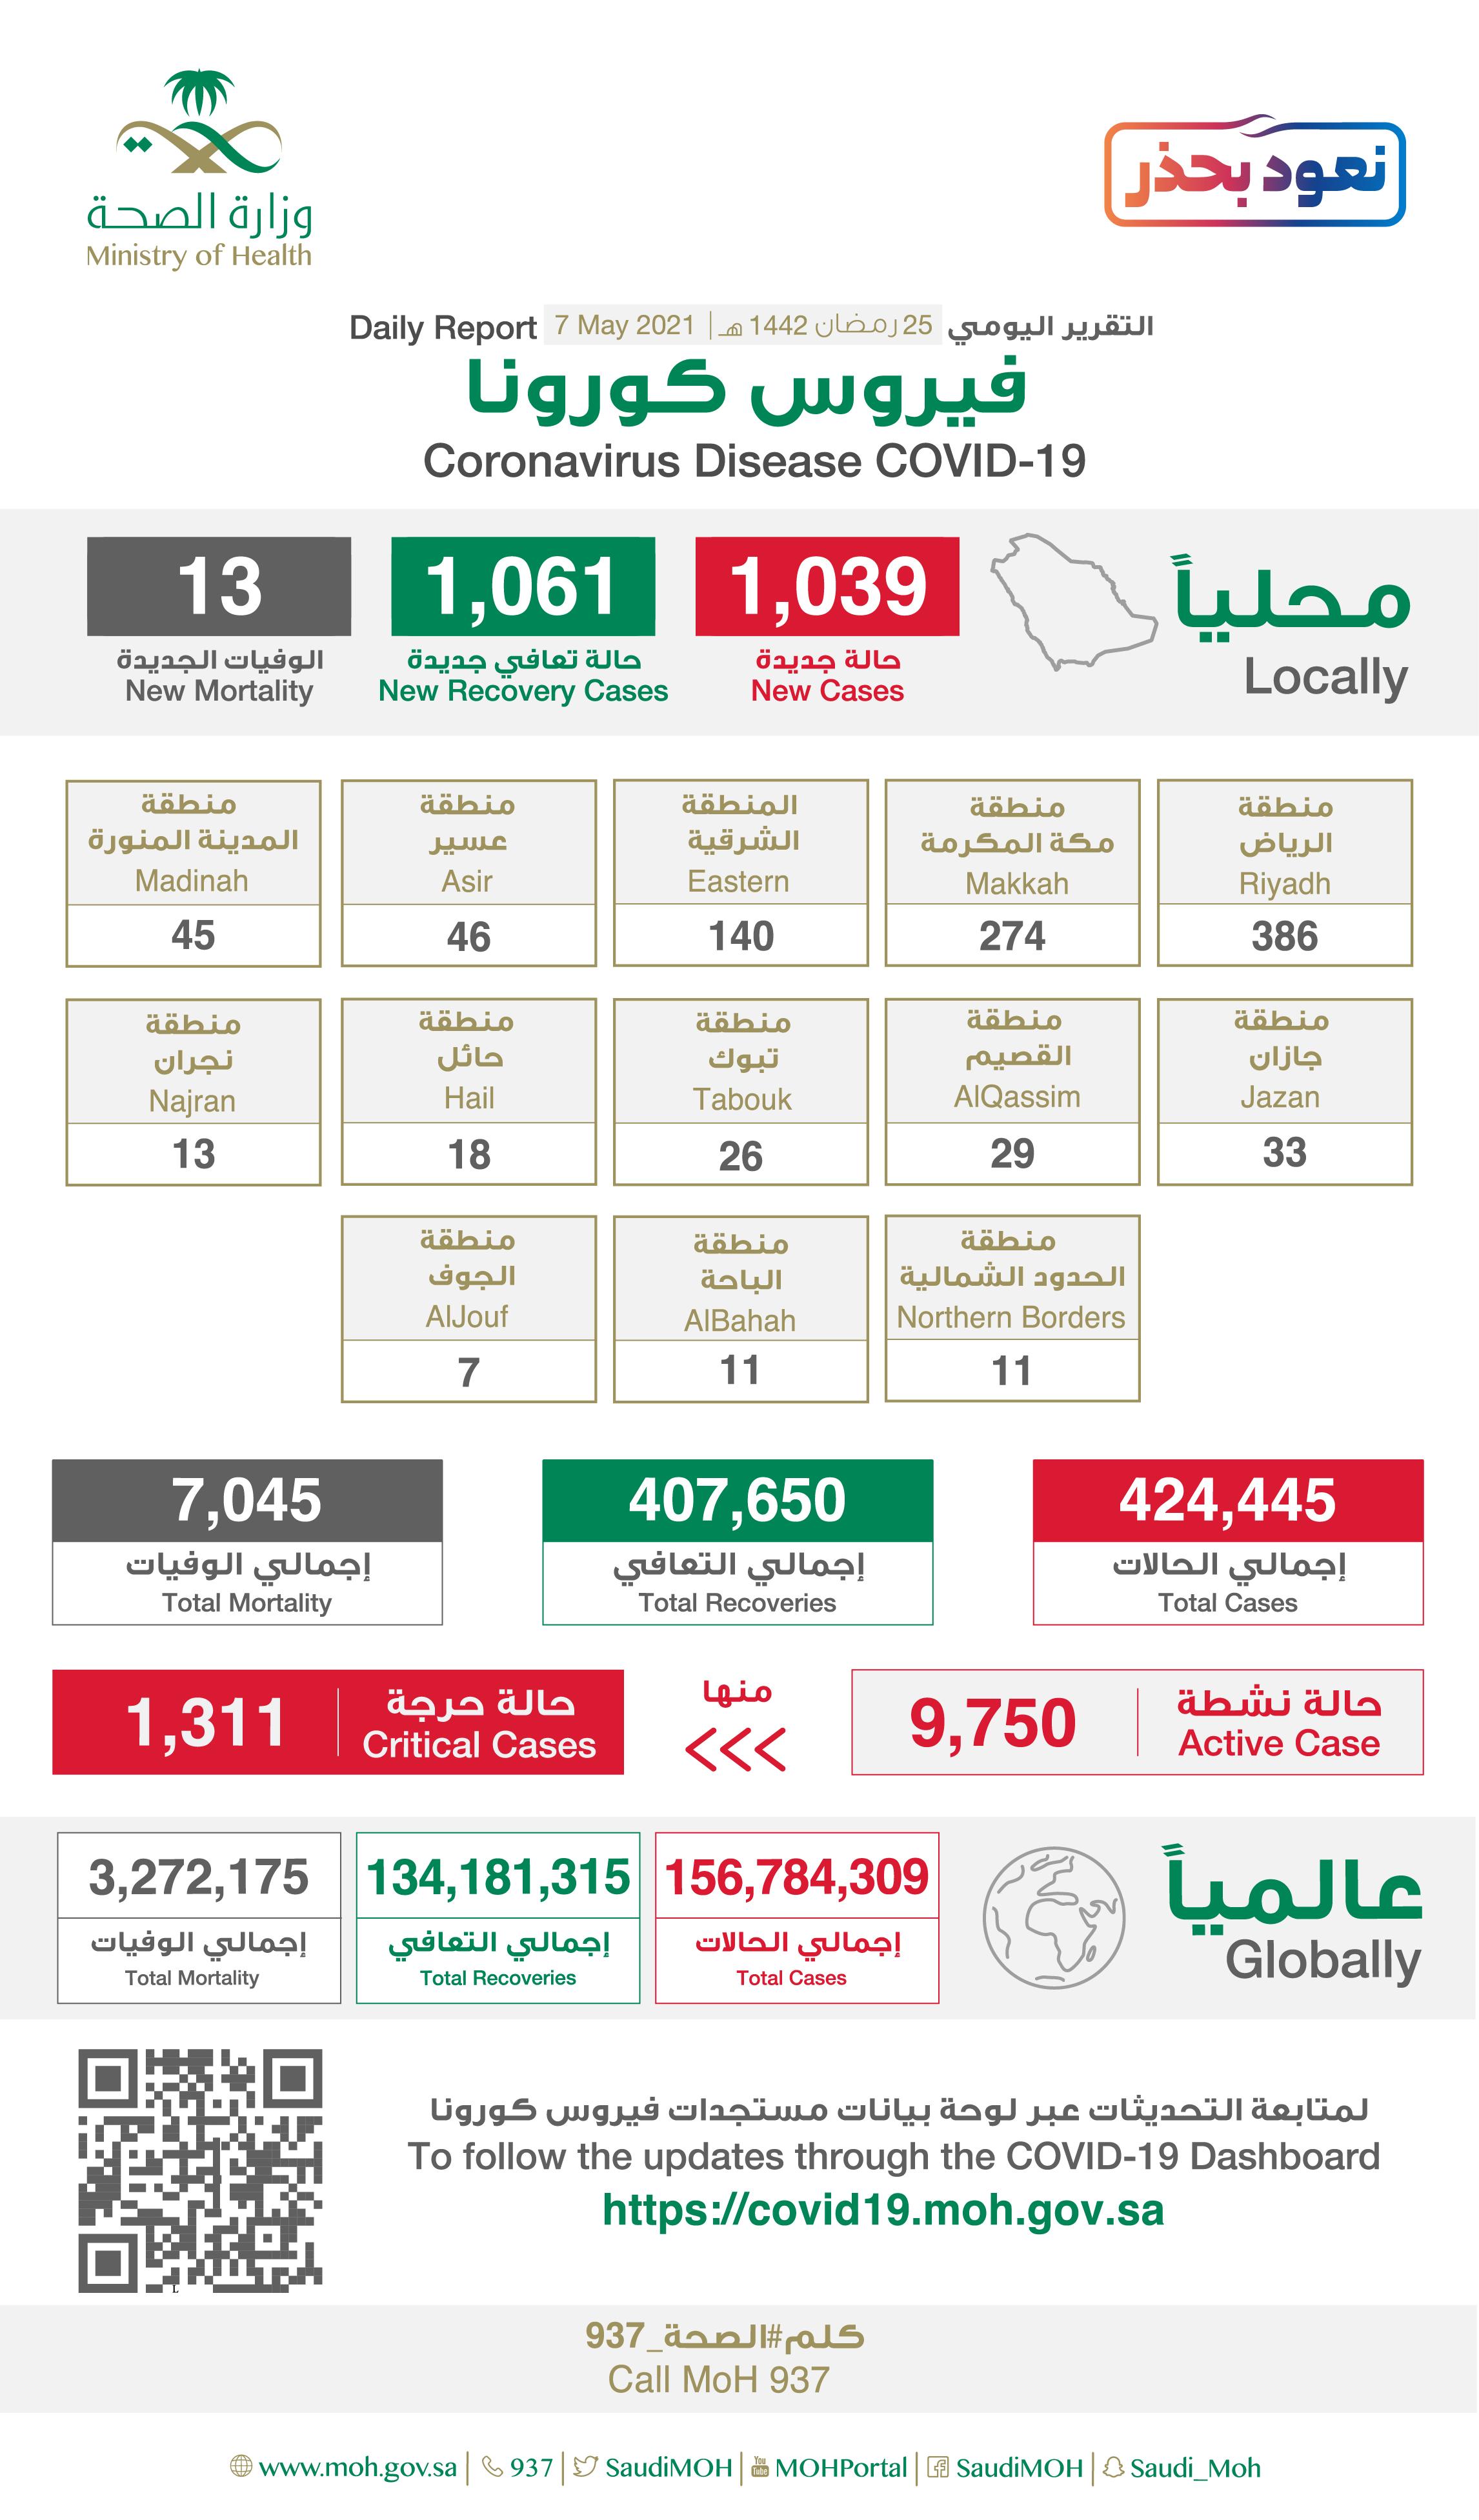 Saudi Arabia Coronavirus : Total Cases :424,445 , New Cases : 1,039 , Cured : 407,650 , Deaths: 7,045, Active Cases : 9,750